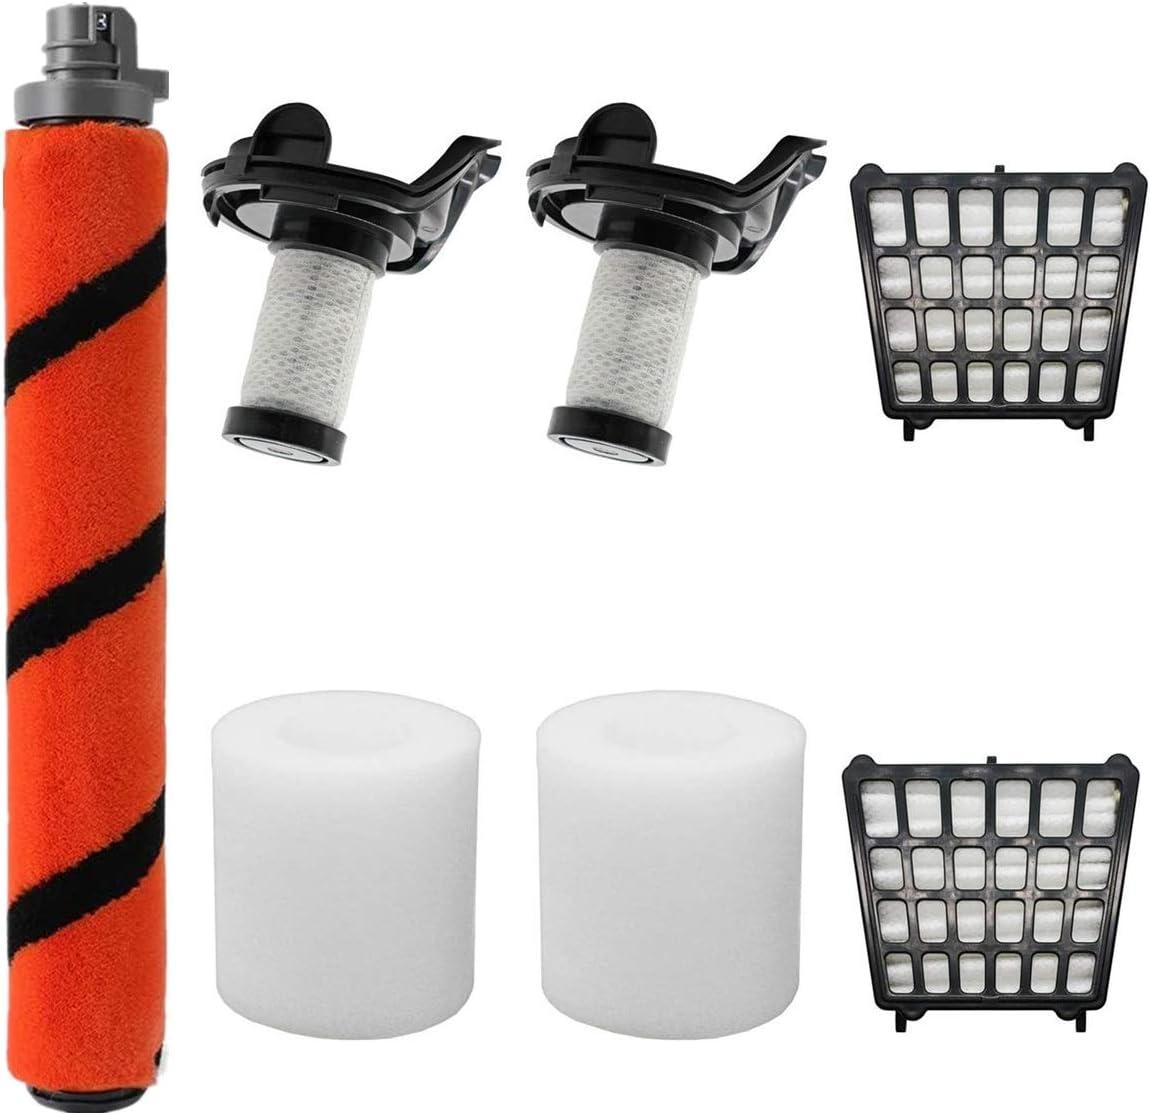 LLHome 1Carpet Roller Brush 2 HEPA Filters 2 Foam Filters 2 Pre-Motor Filters Replacement Parts for Shark Flex DuoClean Corded Ultra-Light Vacuum HV390, HV391, HV392.